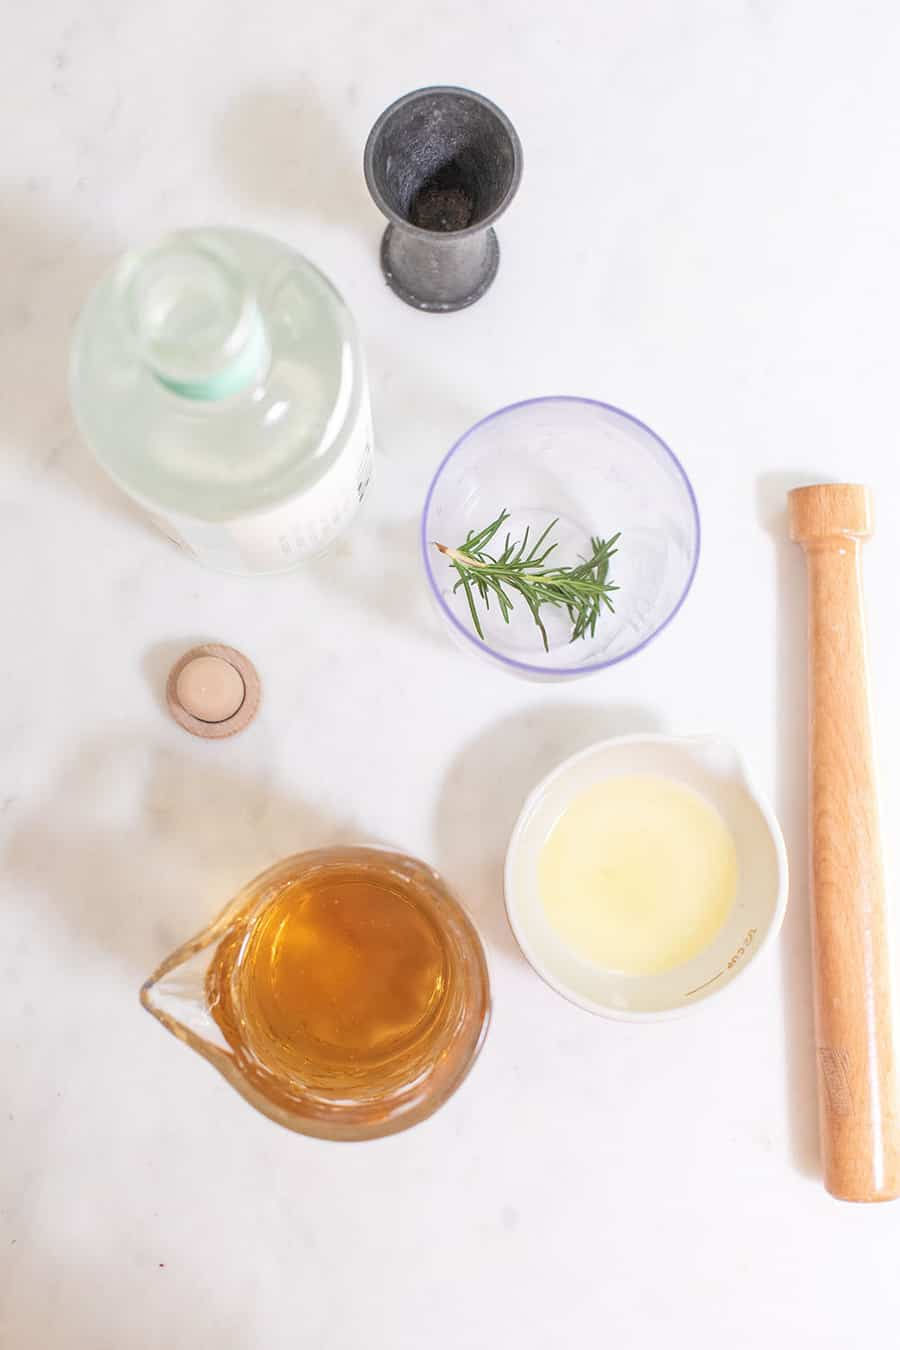 Ingredients to make a mocktail with lemon juice, rosemary, muddler.